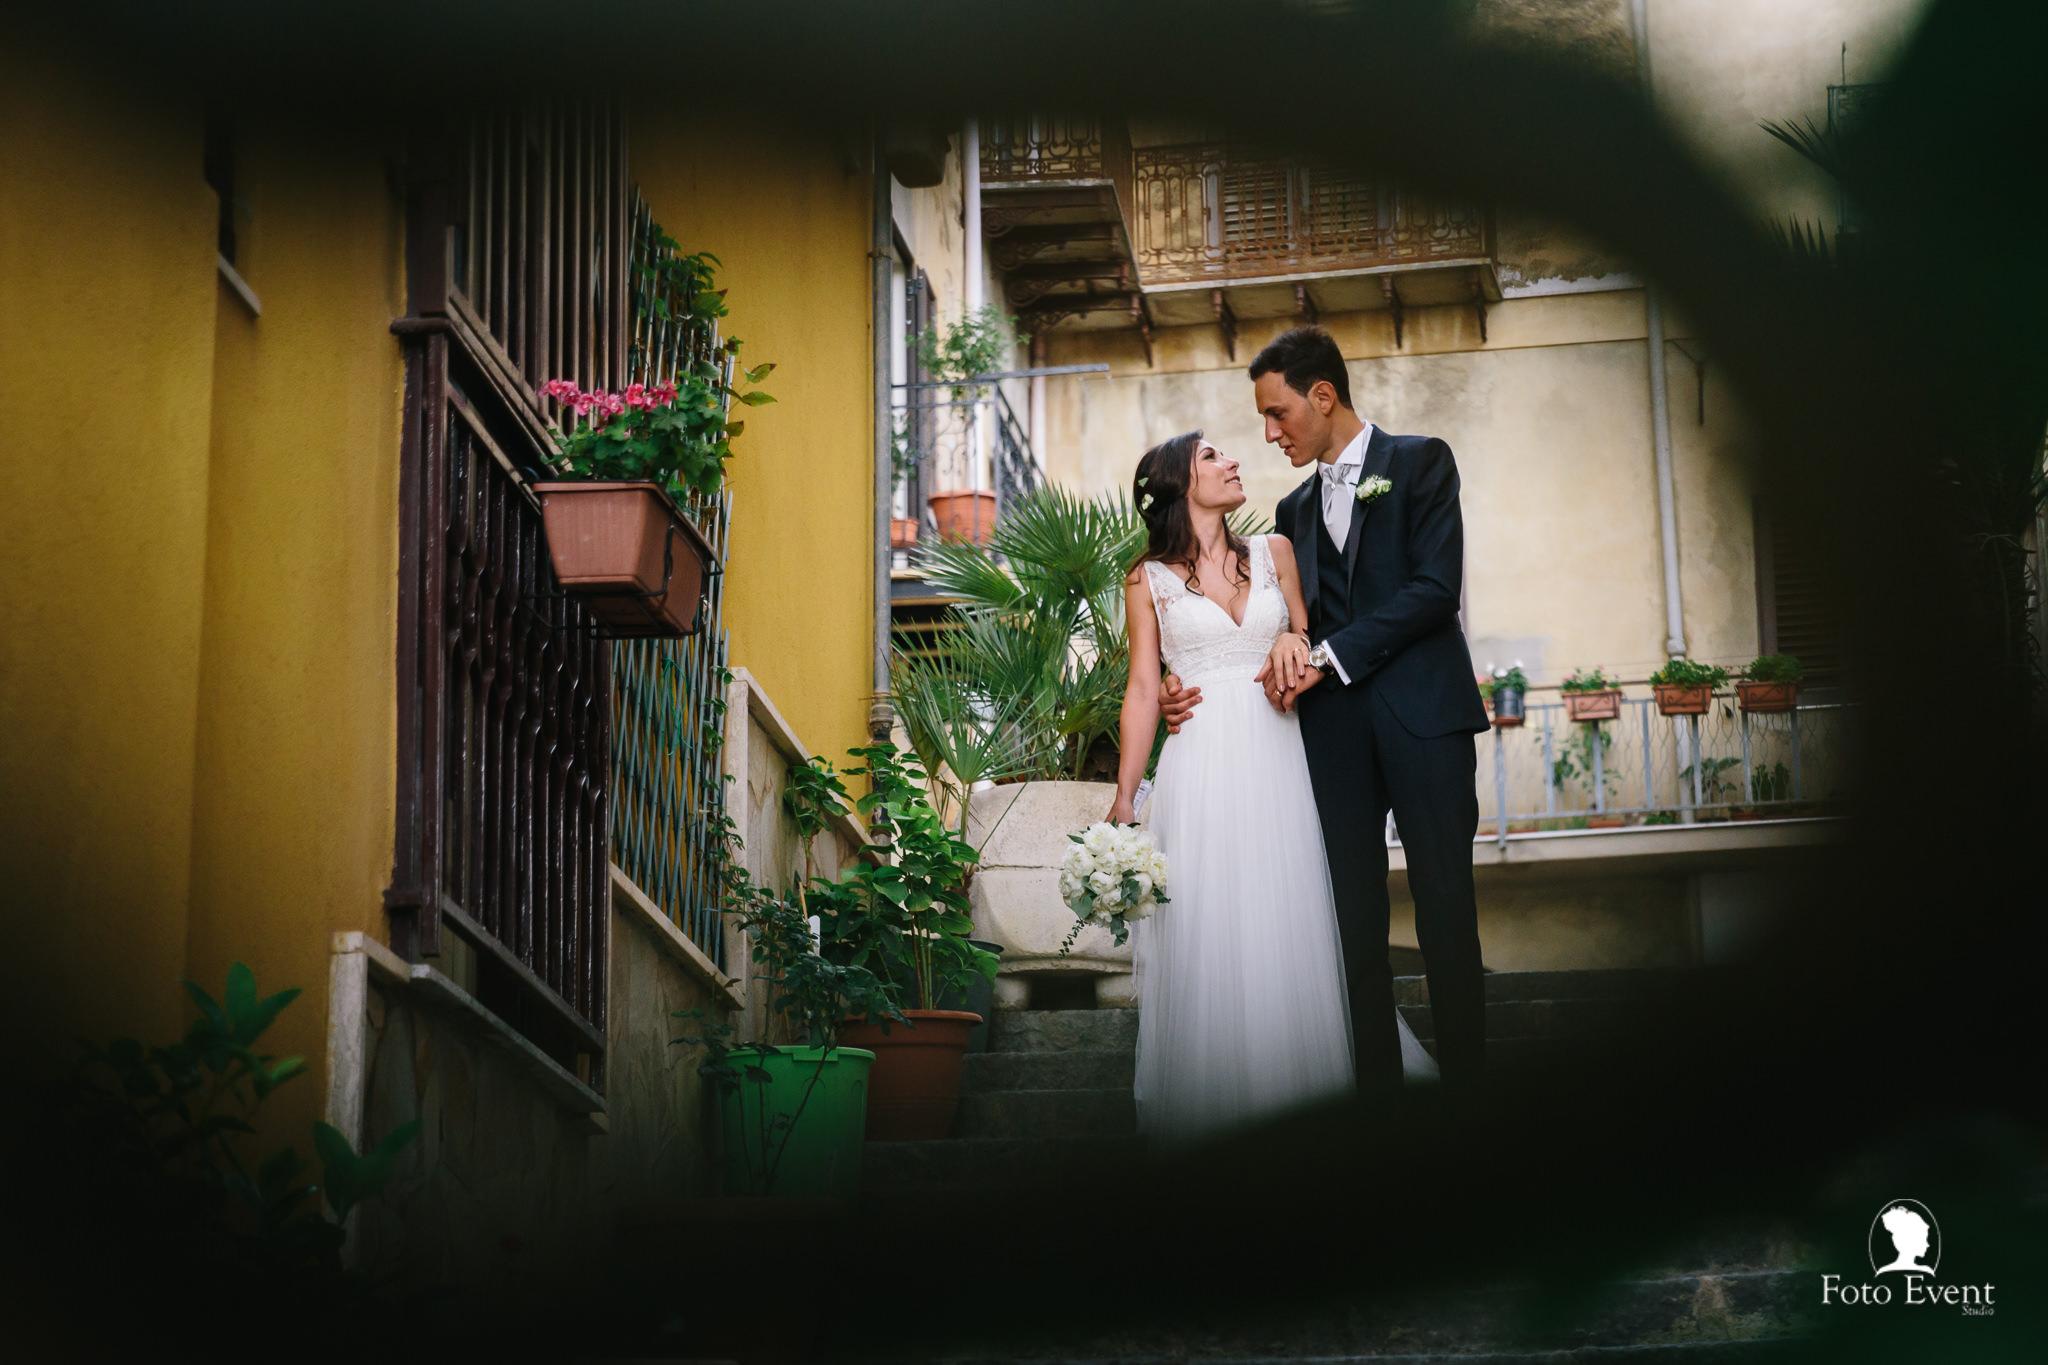 032-2019-08-23-Matrimonio-Lucia-e-Rosario-Scopelliti-5DE-1618